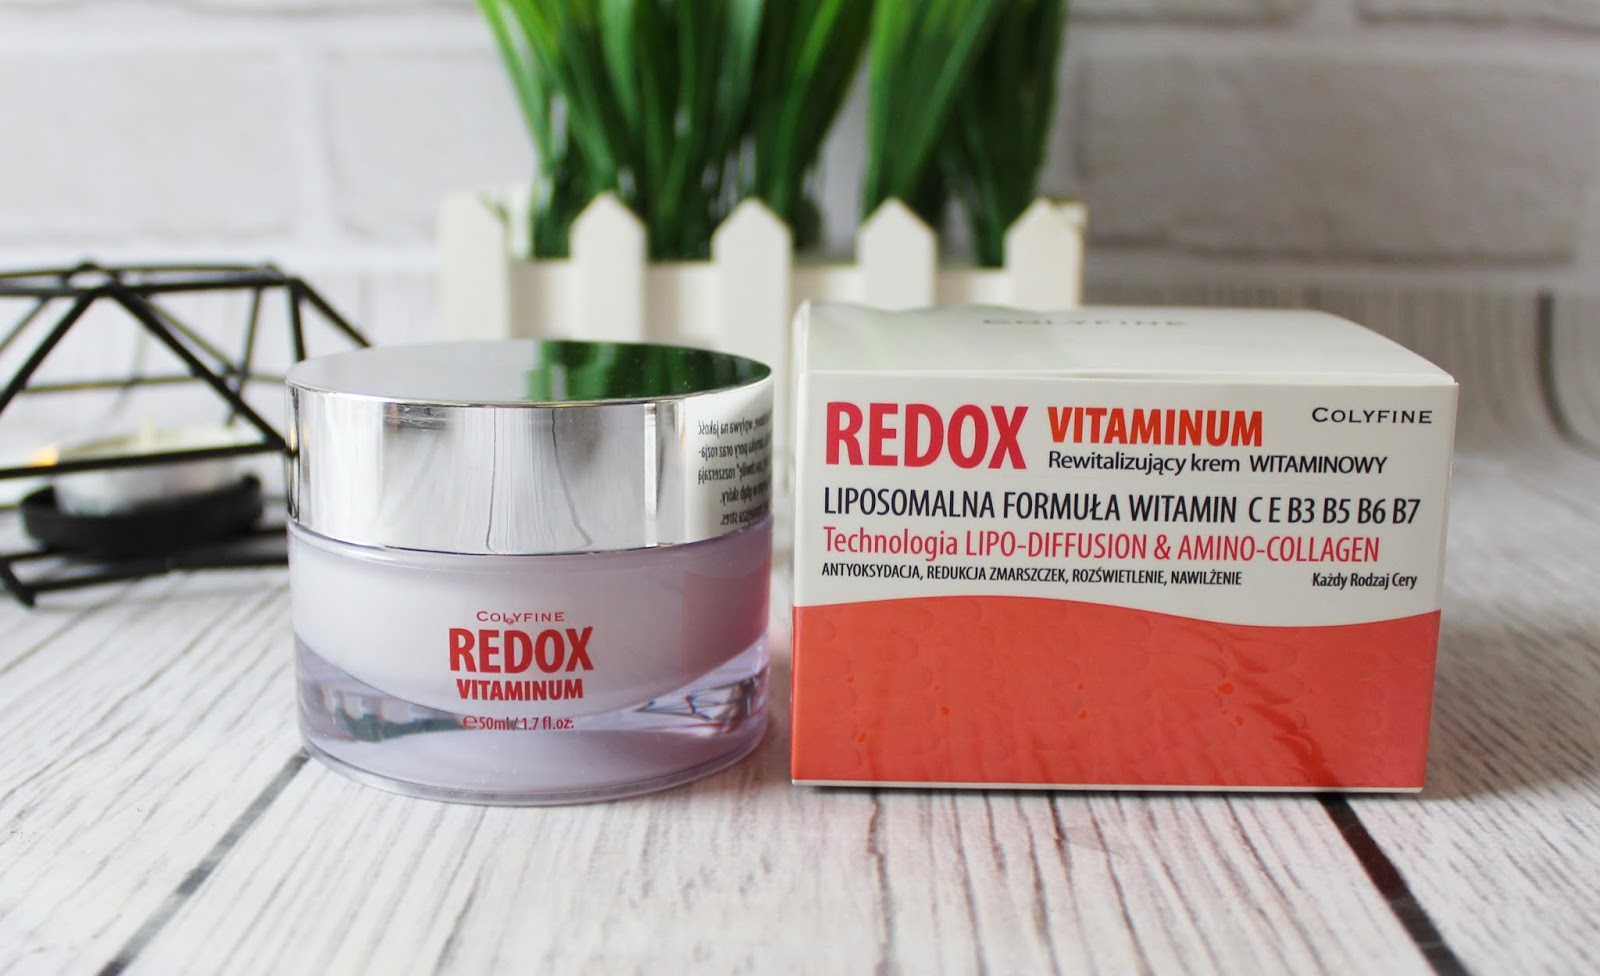 COLYFINE REDOX VITAMINUM + serum regenerujące do ust